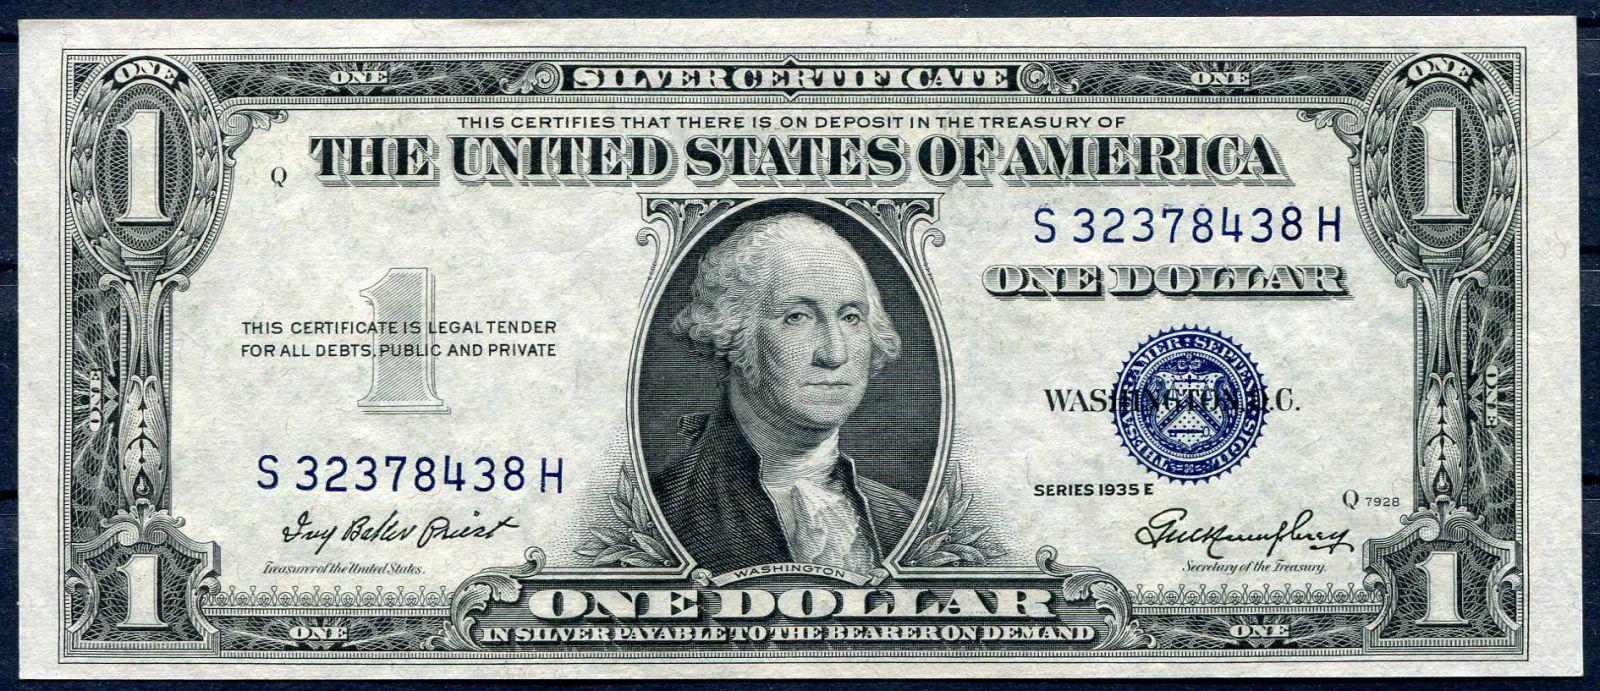 USA - P 416e - 1 dollar 1935 E série (S-H) - UNC (modrá pečeť) | www.tgw.cz